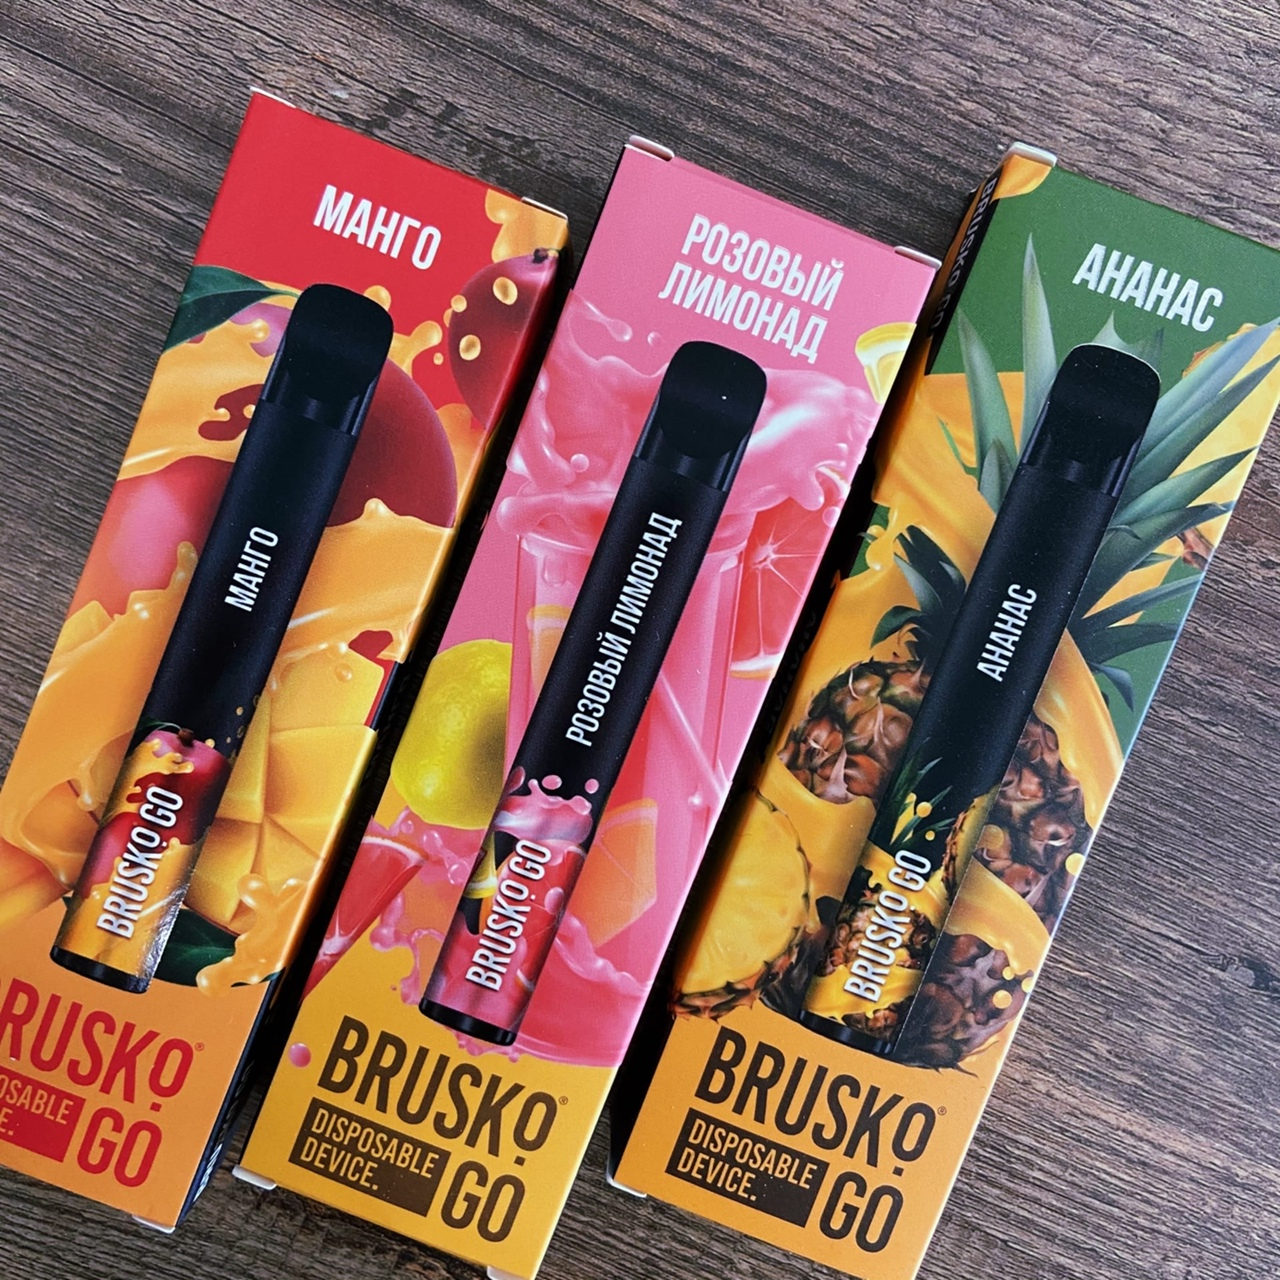 Brusko электронная сигарета купить самара электронная сигарета hqd купить в иркутске